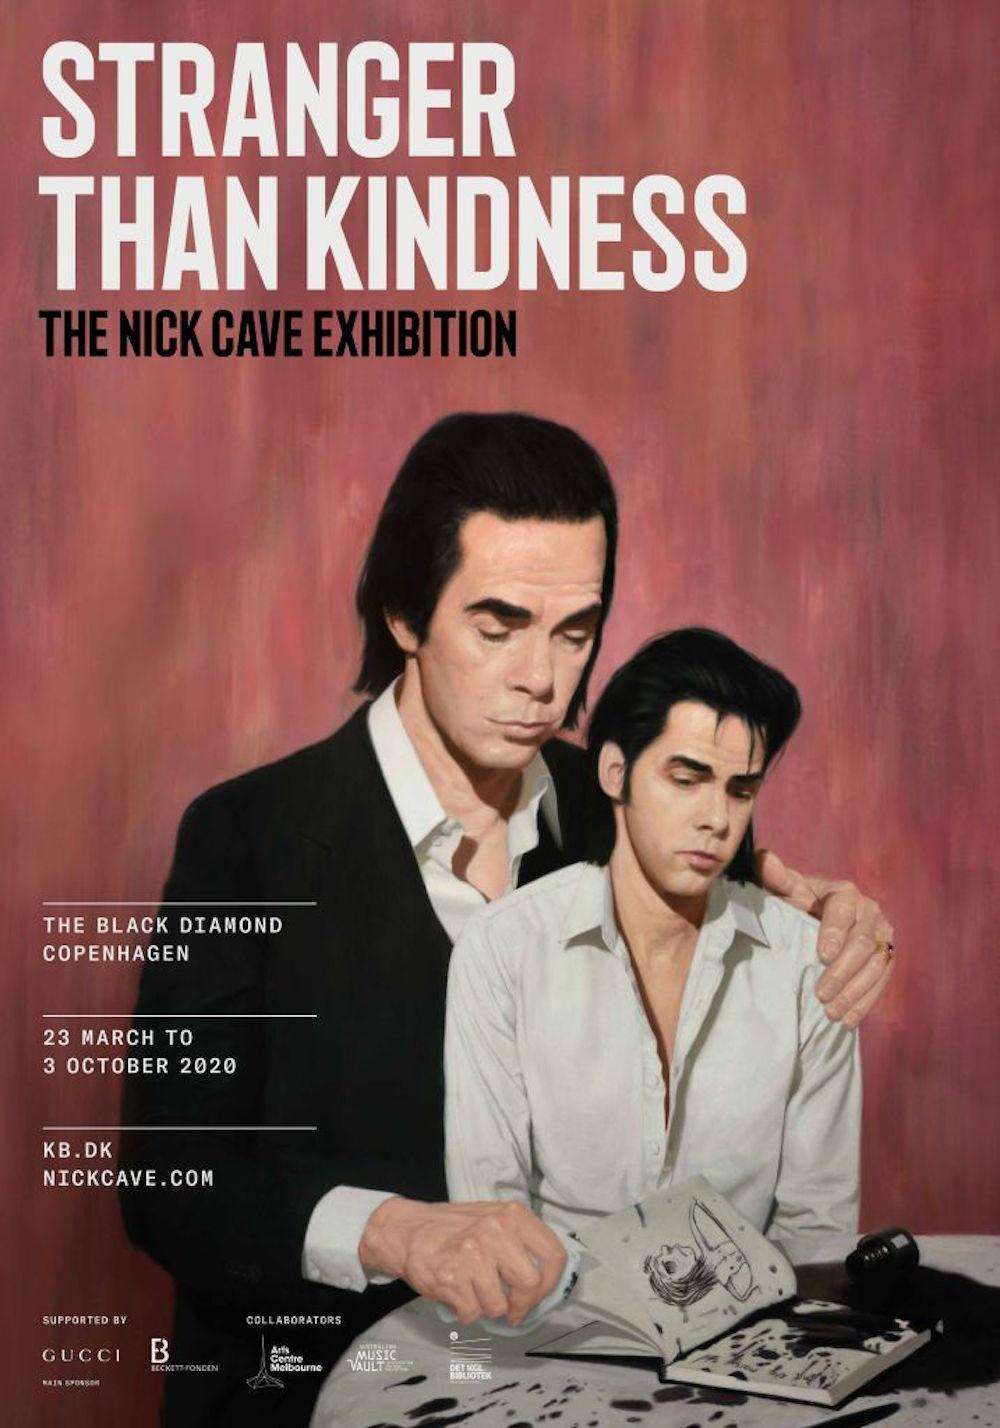 nick cave exhibition stranger kindness copenhagen Nick Cave announces illustrated autobiography Stranger Than Kindness